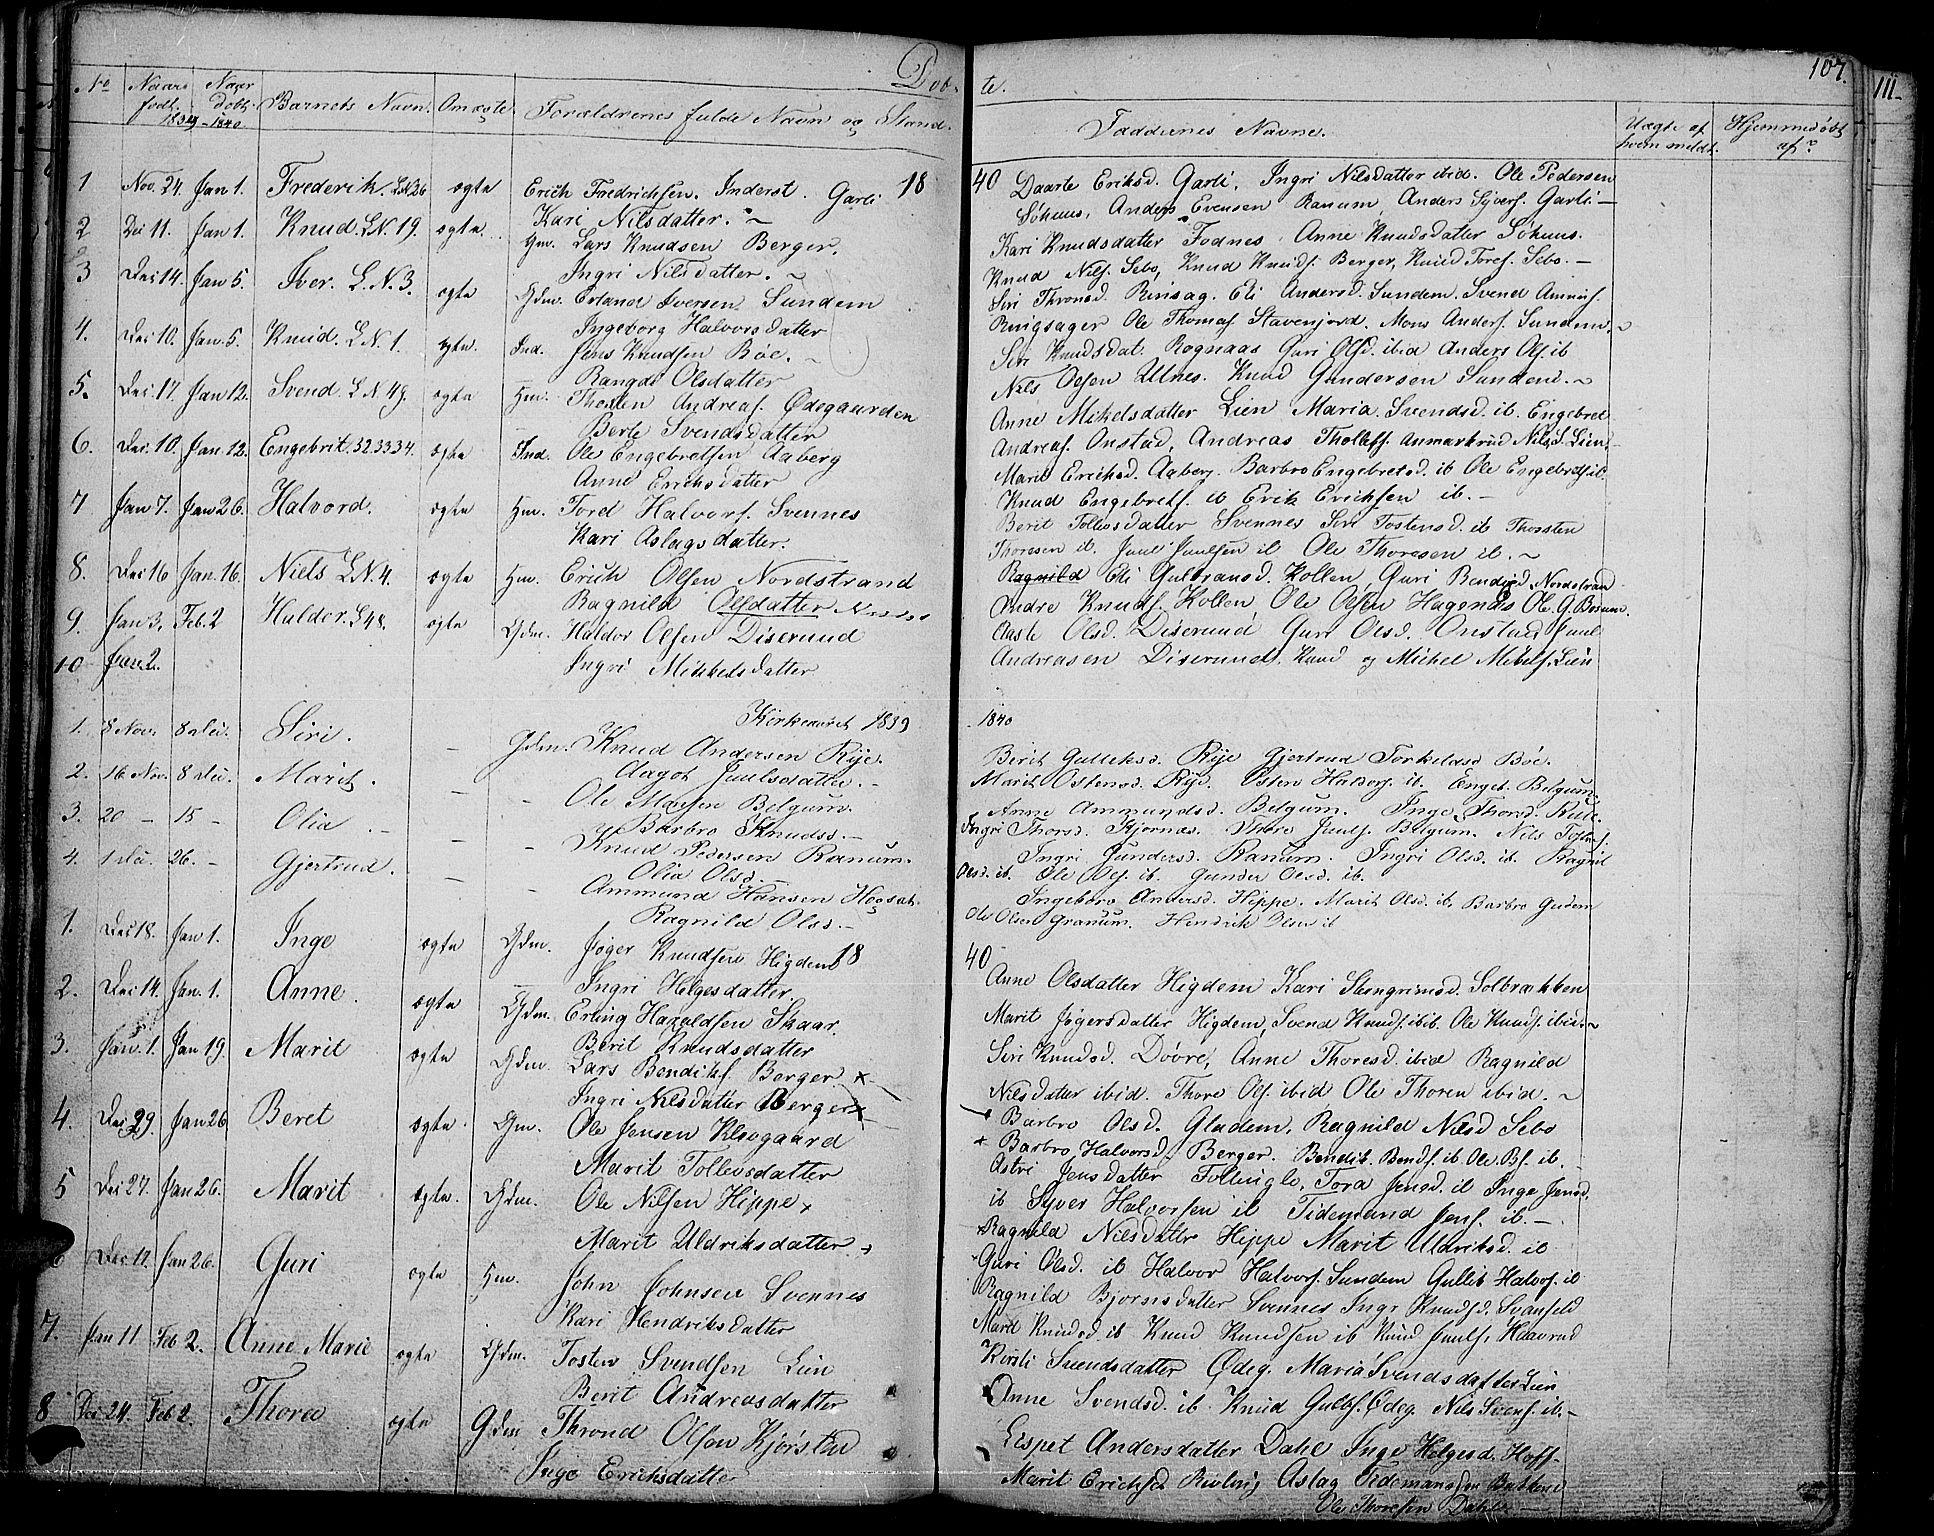 SAH, Nord-Aurdal prestekontor, Ministerialbok nr. 3, 1828-1841, s. 107